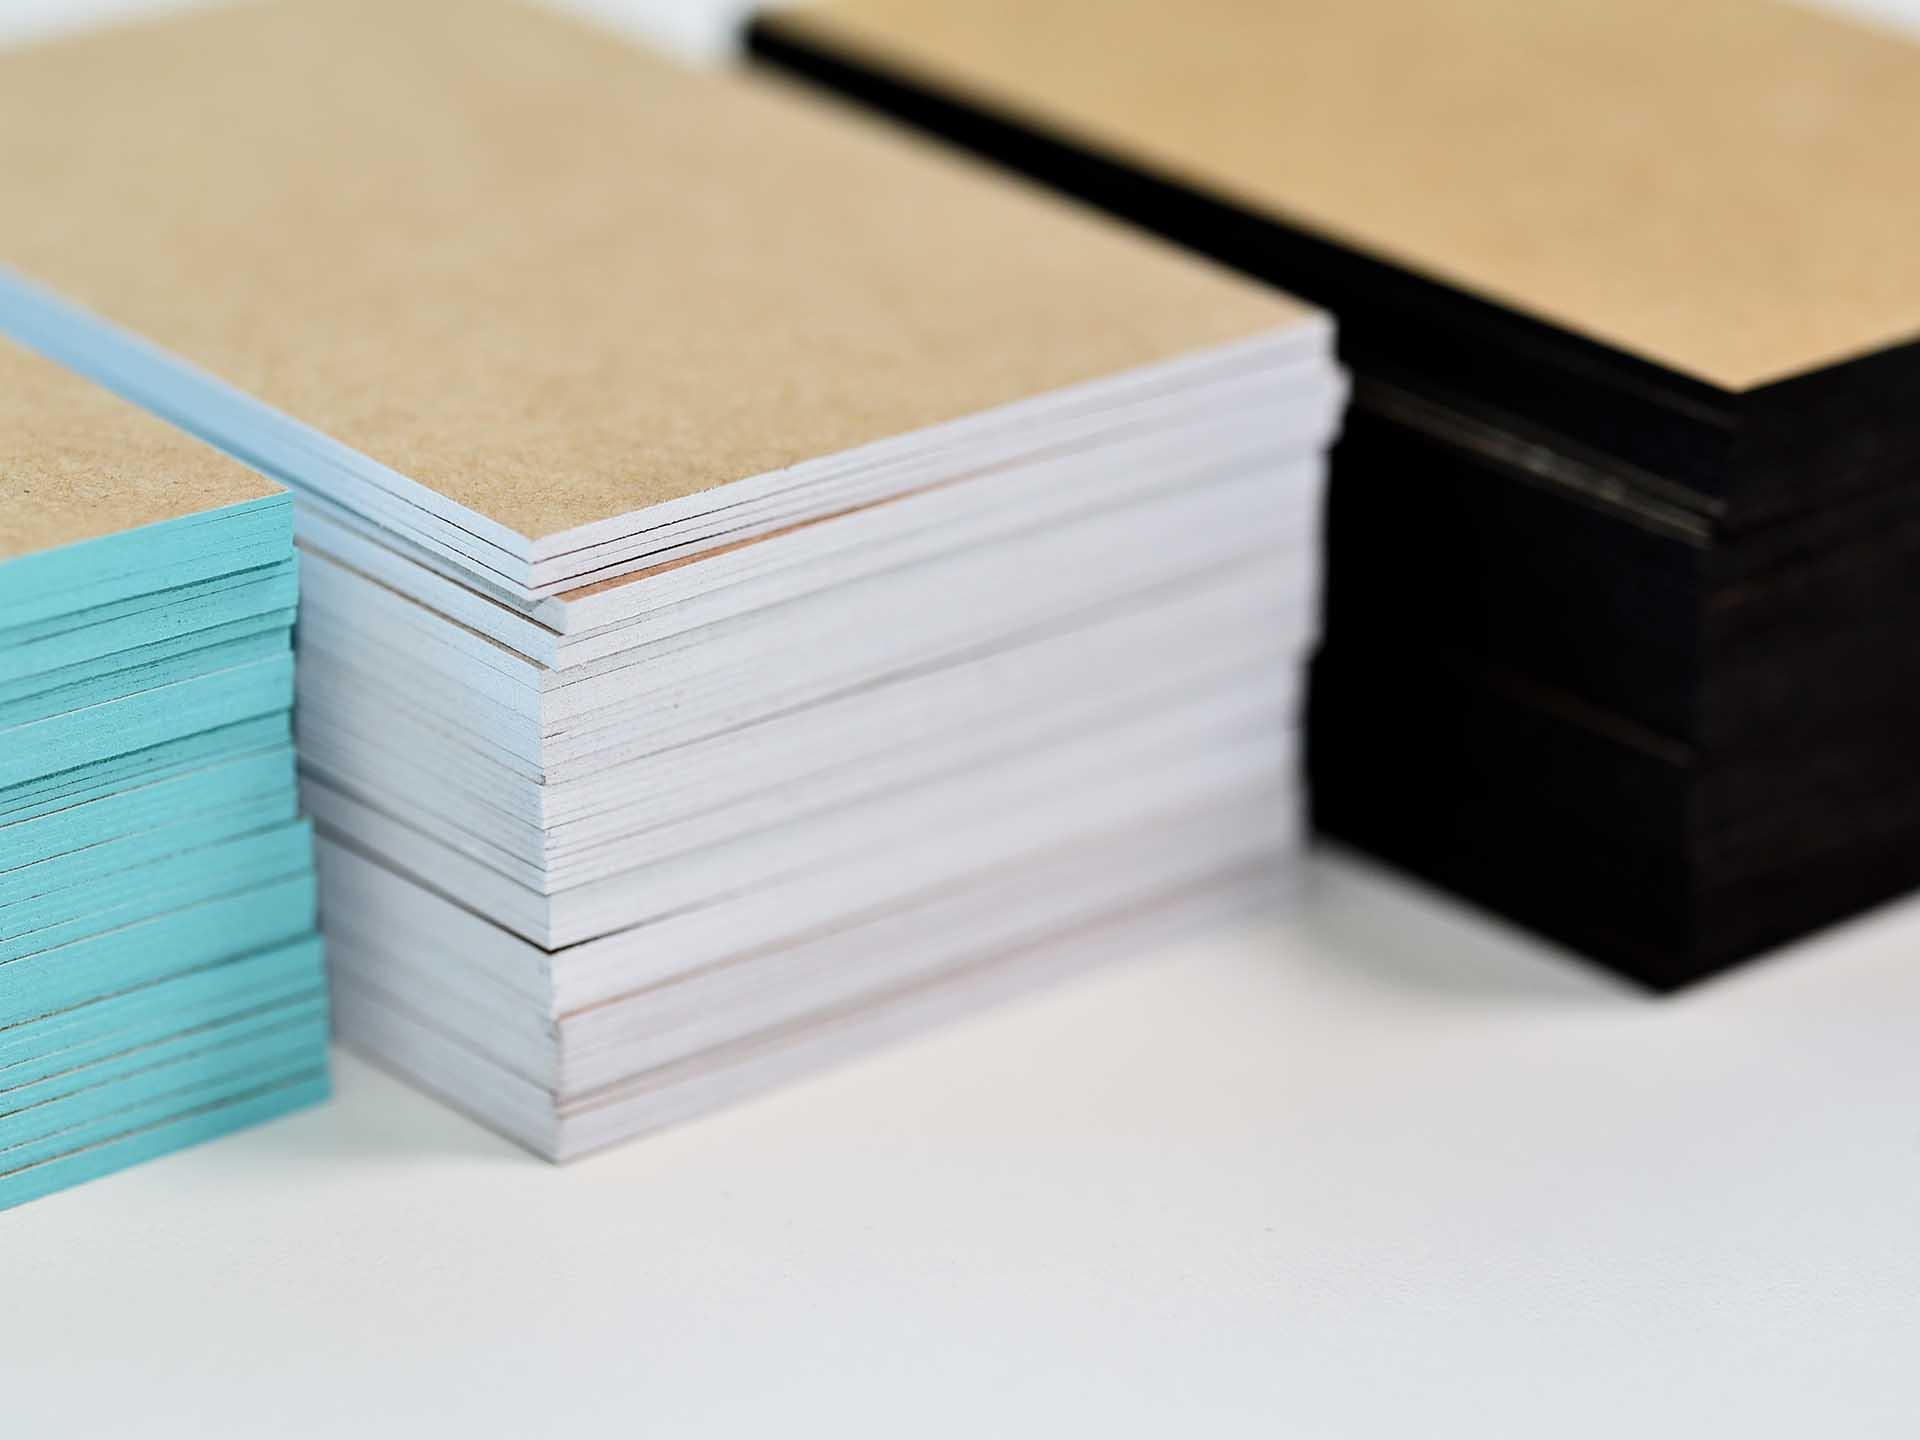 Blanko Visitenkarten Mit Farbschnitt Jetzt Mit Kraftkarton